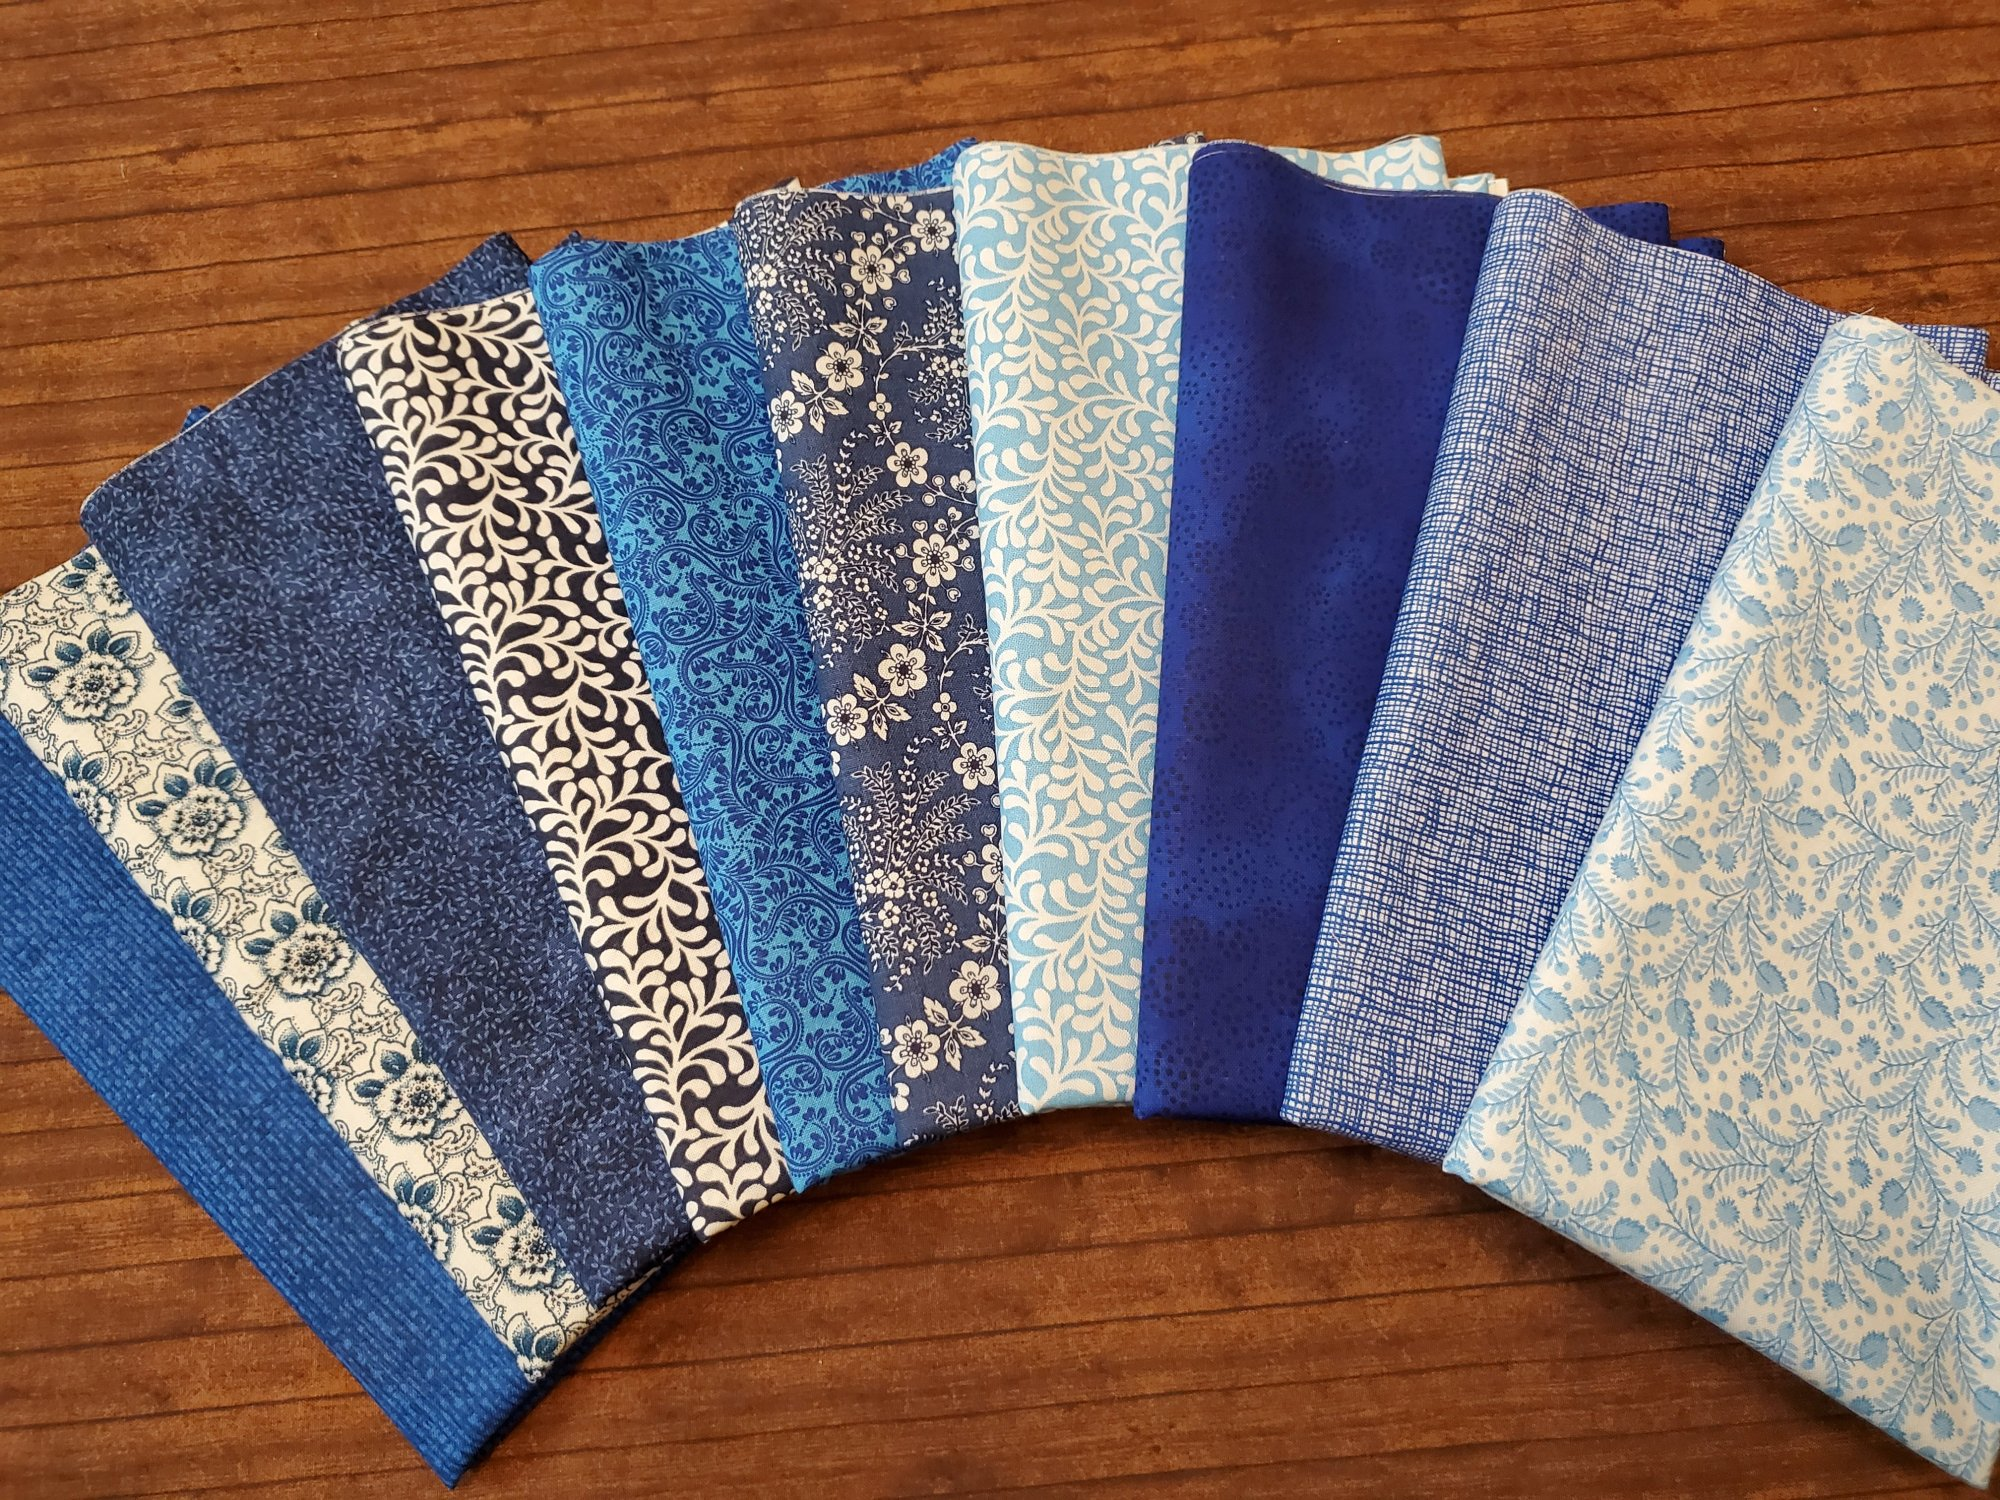 Mixed Variety of Blues - Rachael's Picks - 10 Piece Half Yard Bundle Pack